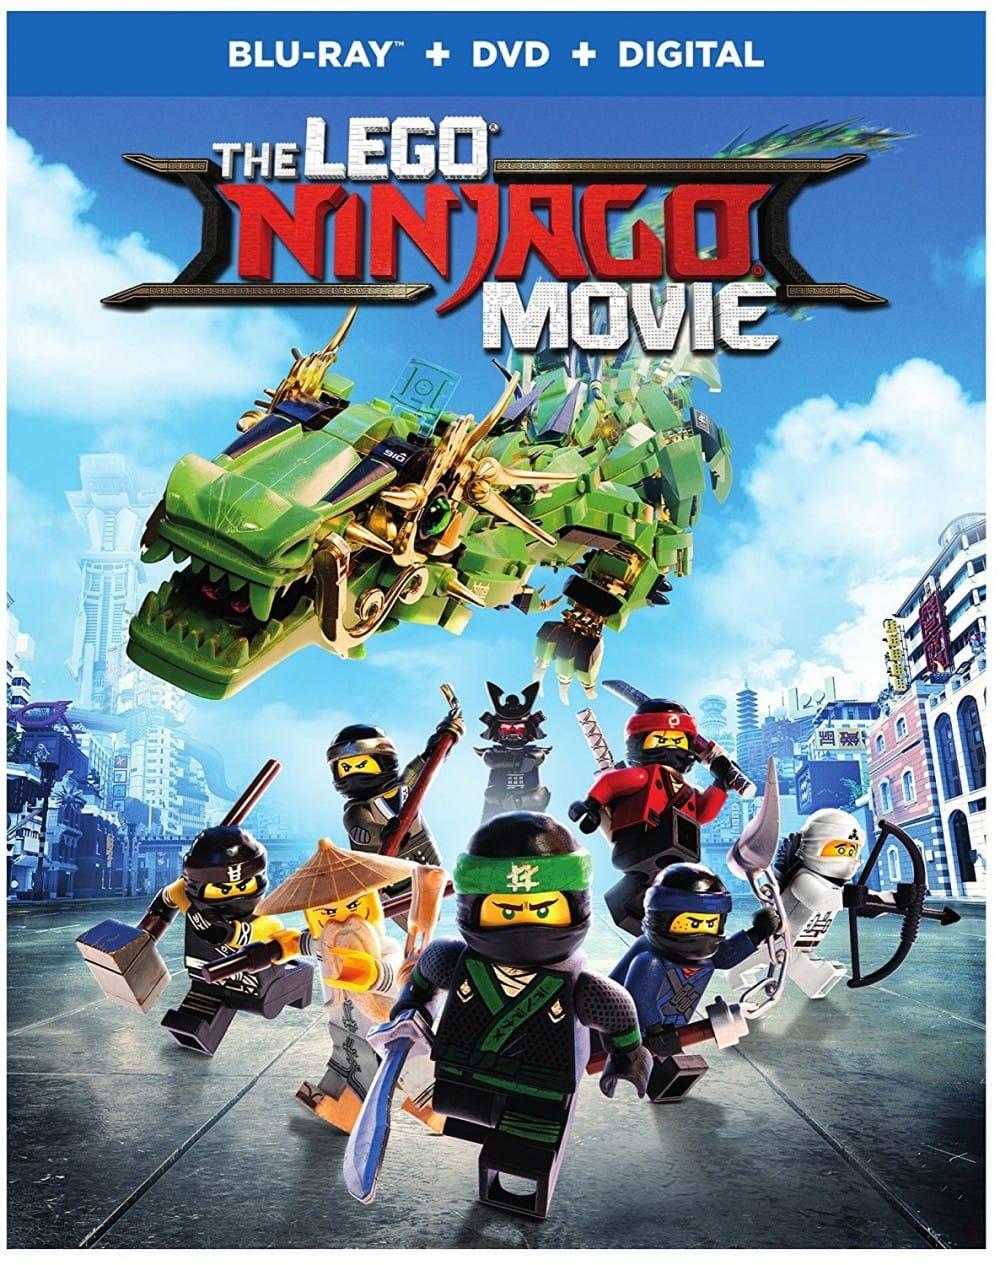 The LEGO NINJAGO Movie on Blu-Ray and DVD